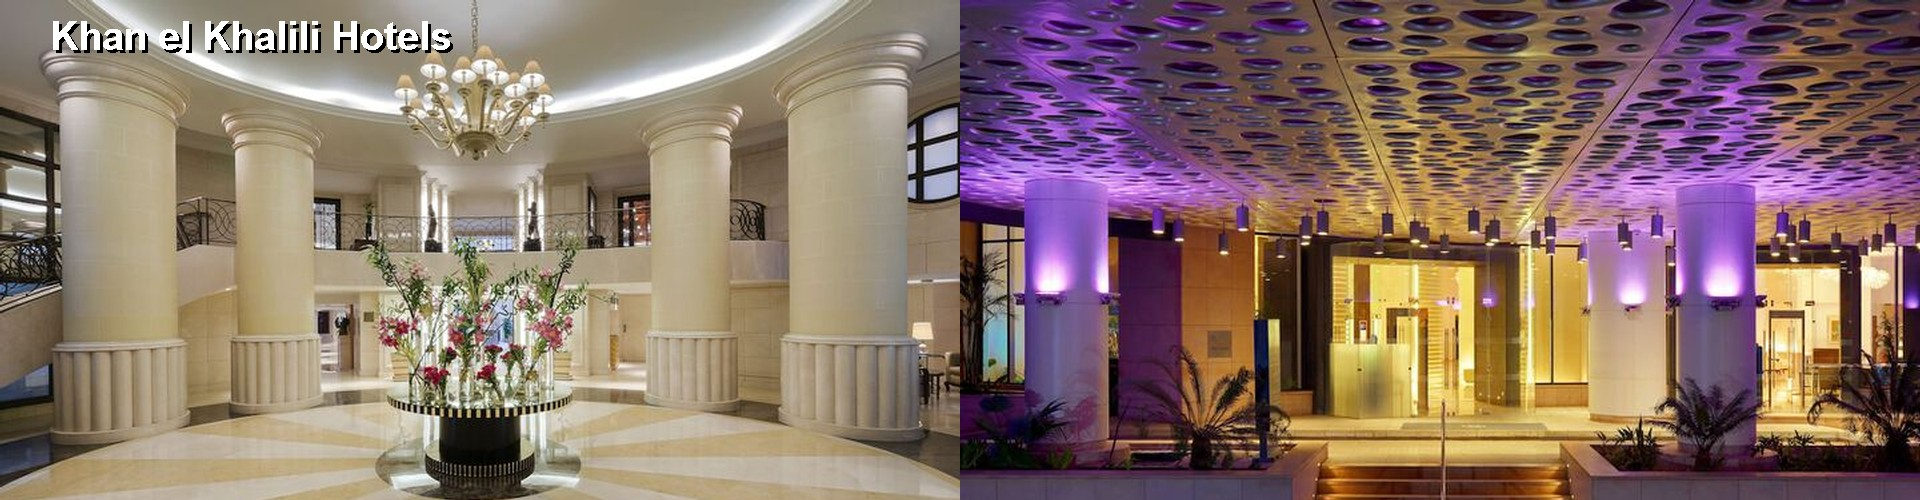 BEST Hotels Near Khan el Khalili in Cairo